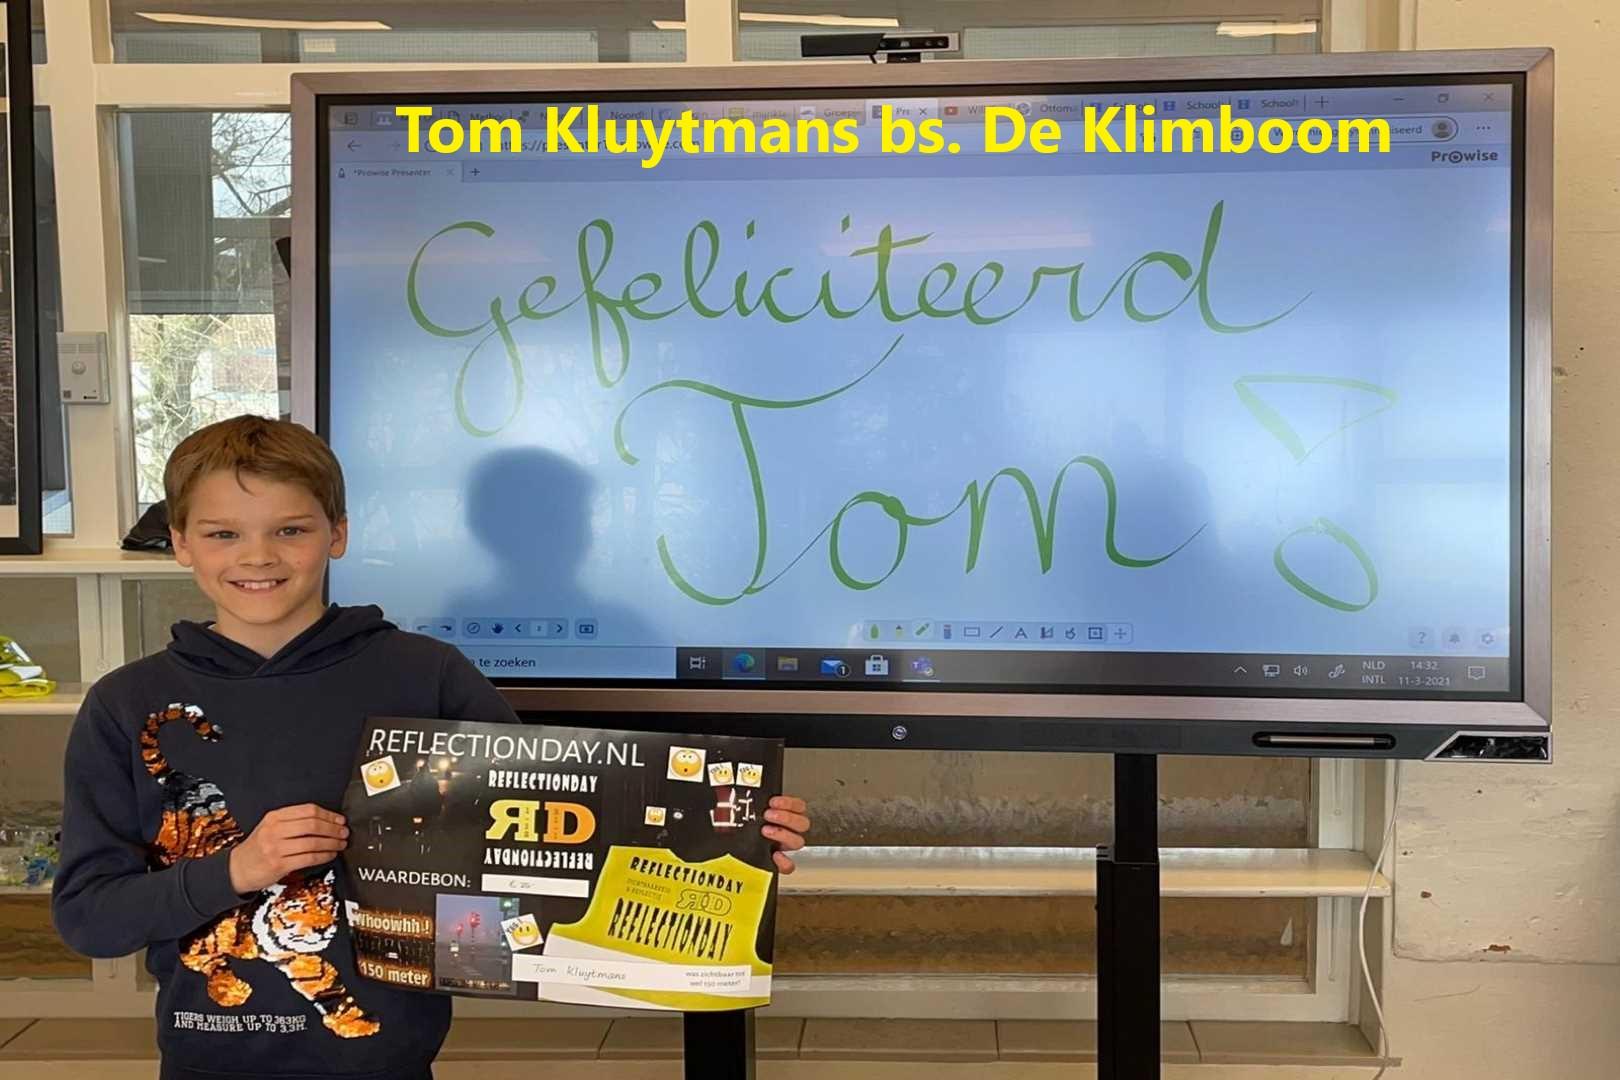 RD2020 Tom Kluytmans De Klimboom